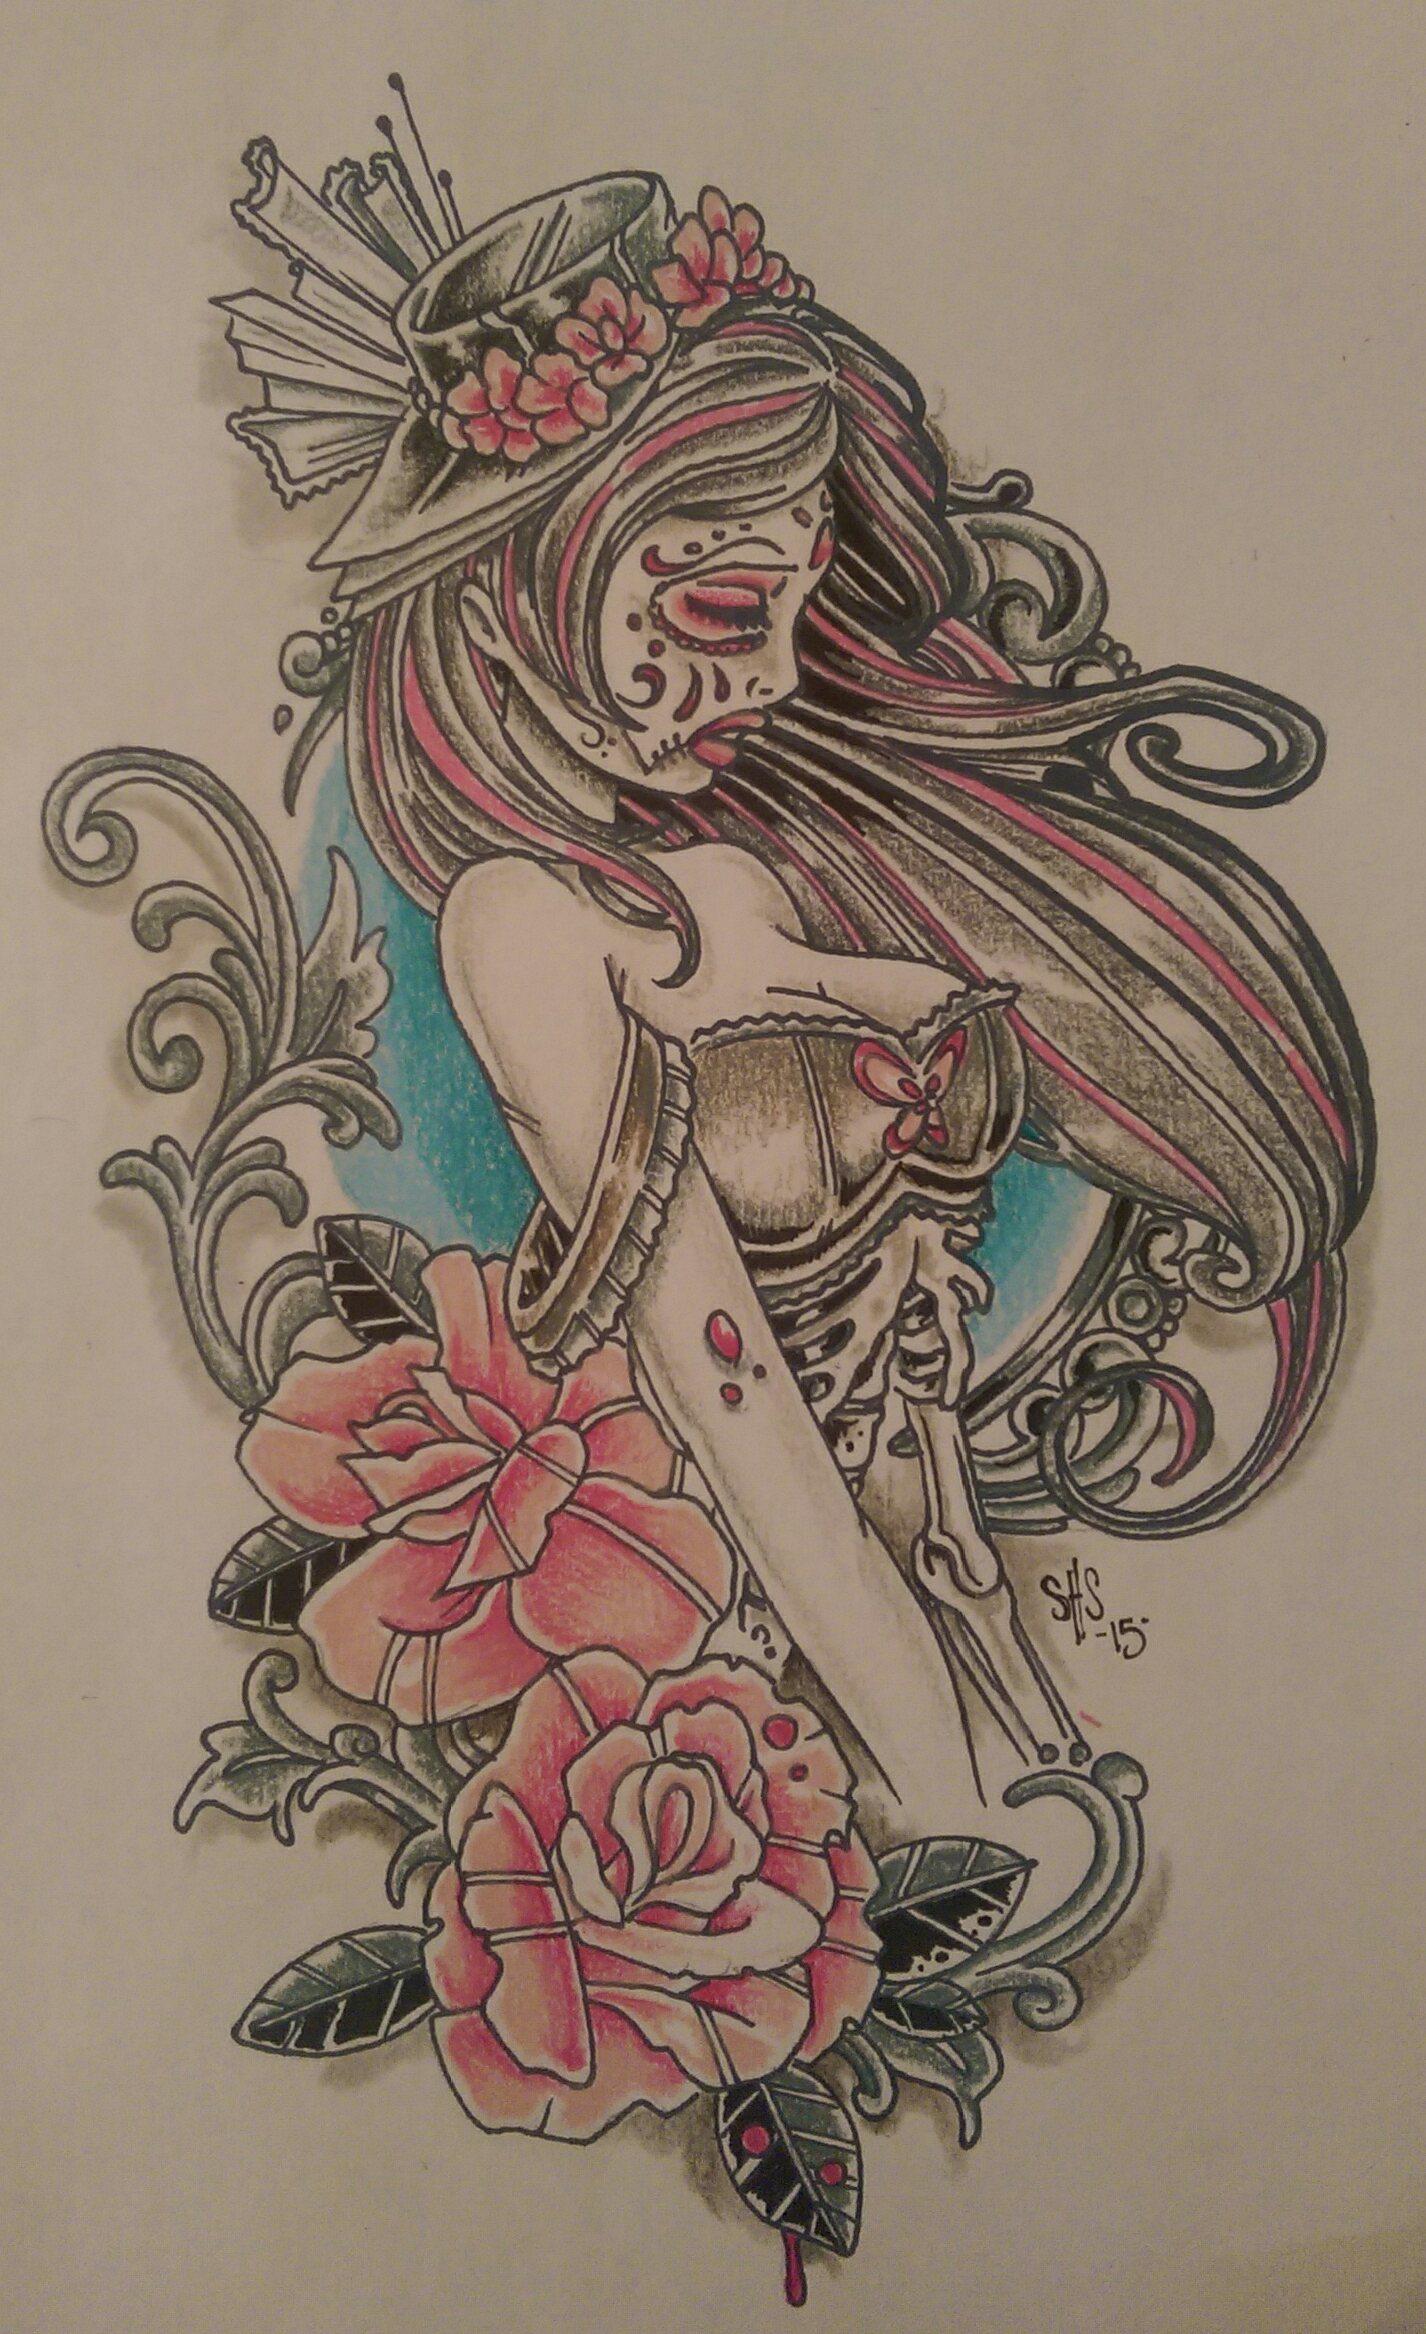 Tattoo Design Drawing by Raul Regalado Longmont Tattoo – Skinhouse Studio